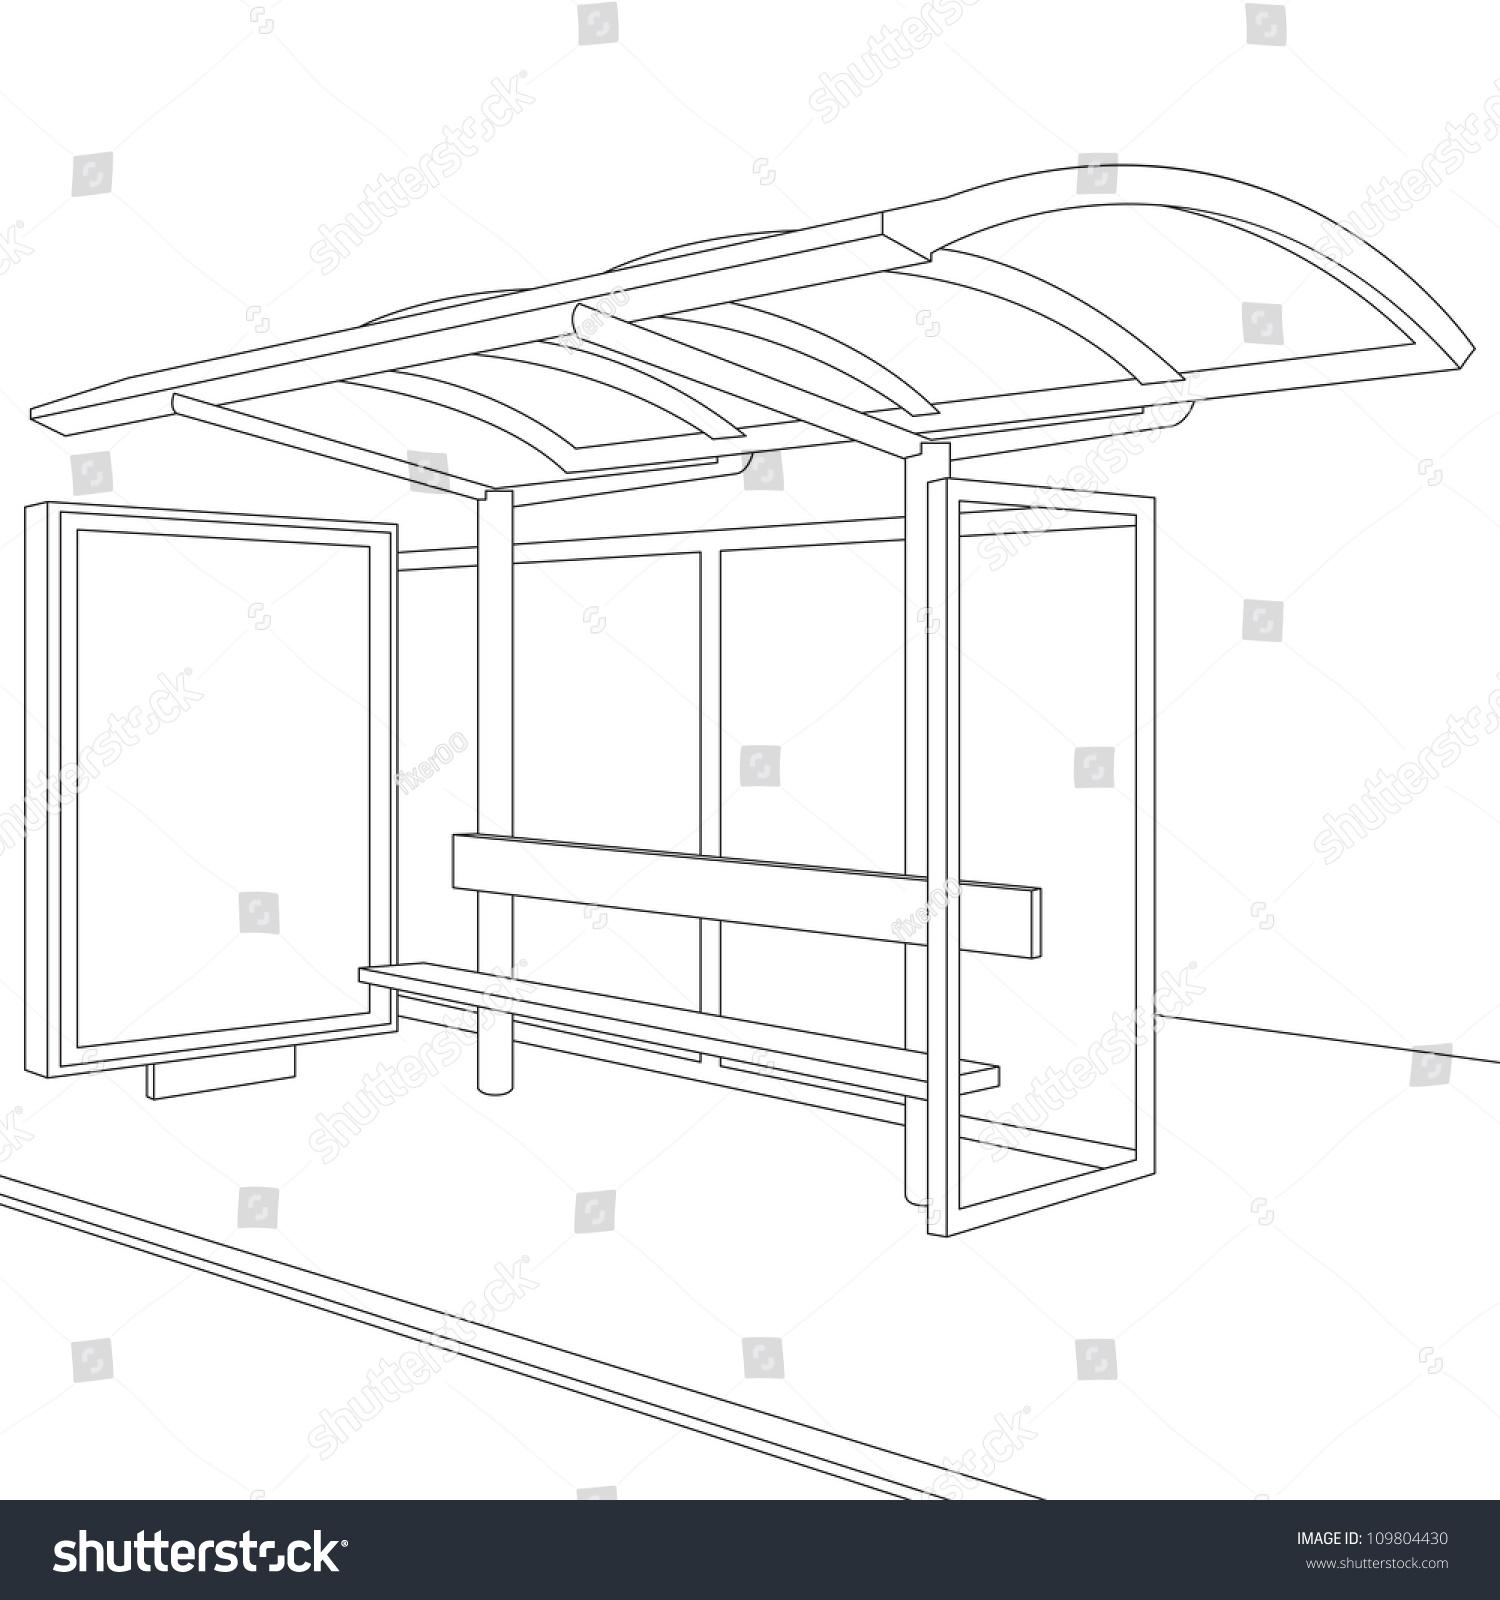 bus stop empty design template branding stock illustration